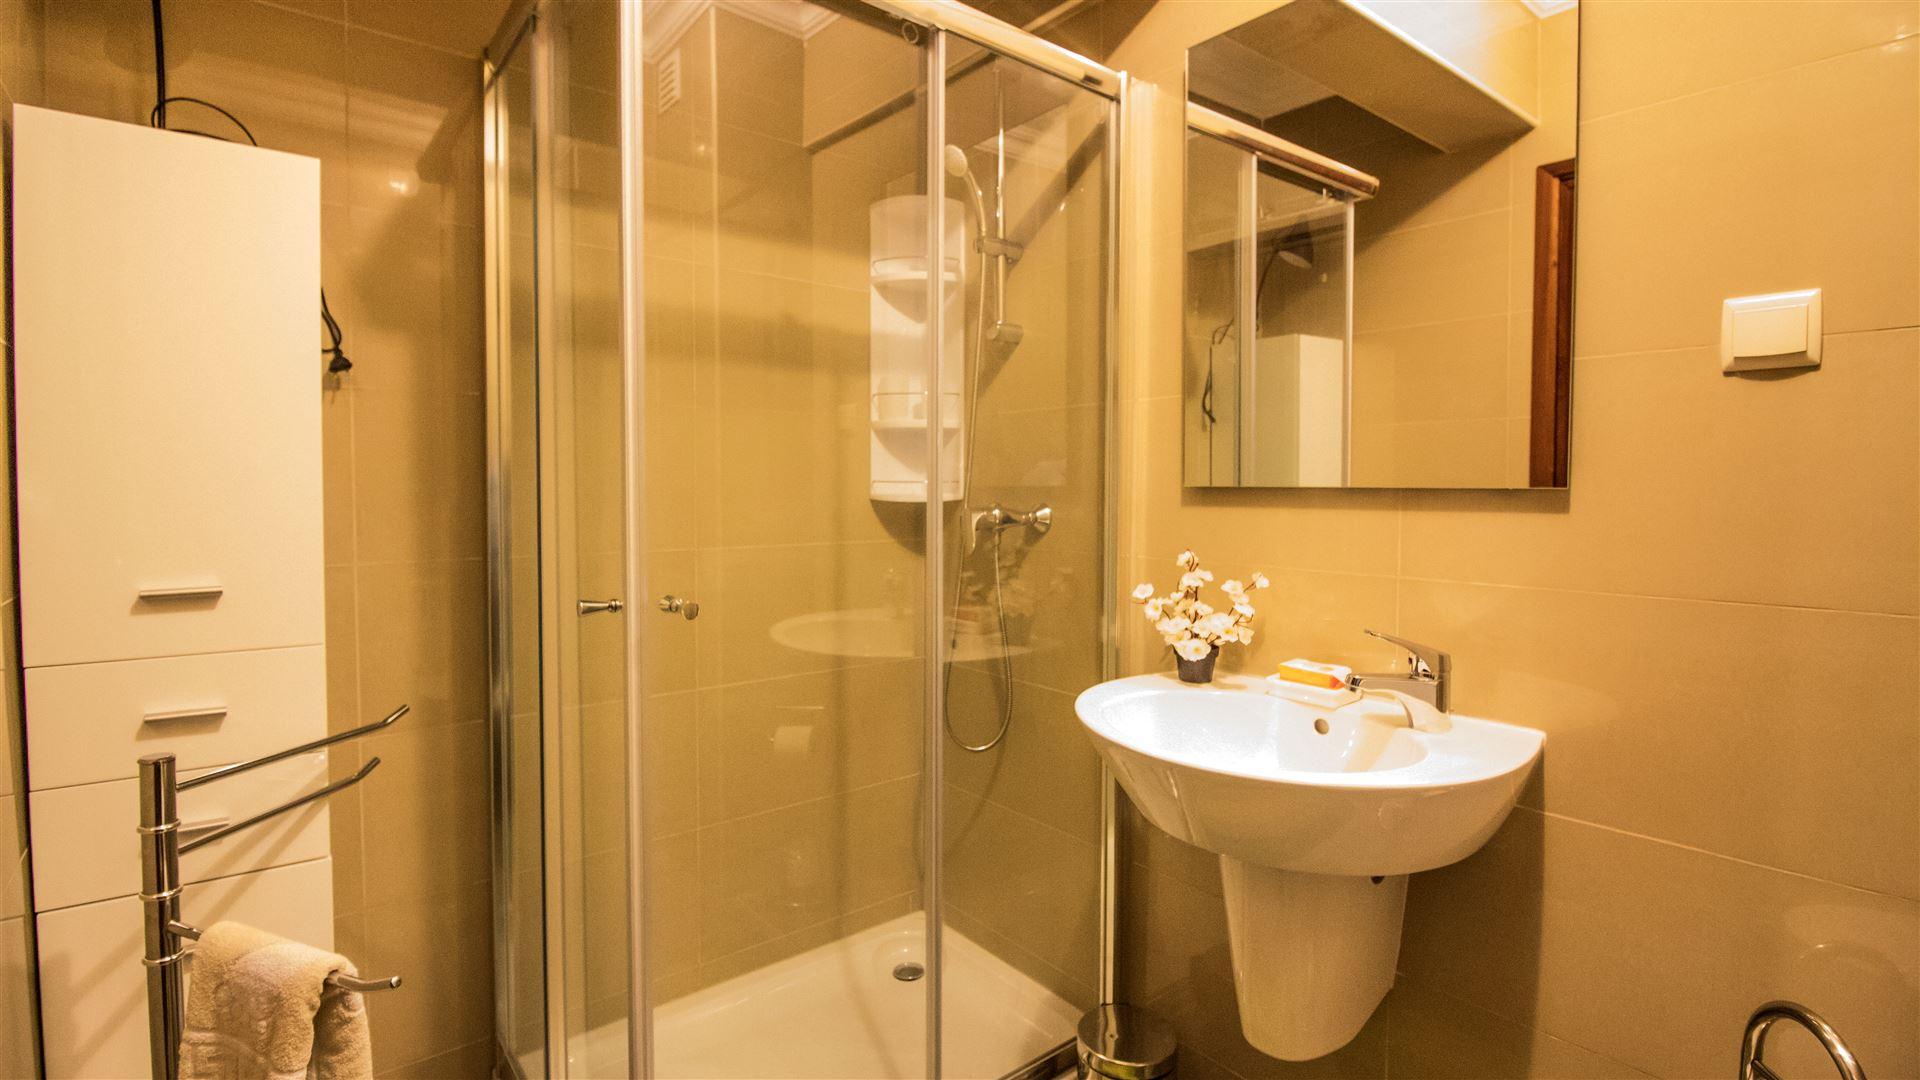 Apartamento  T2 para arrendar - Algarve, Monte Gordo, Vila Real de Santo António